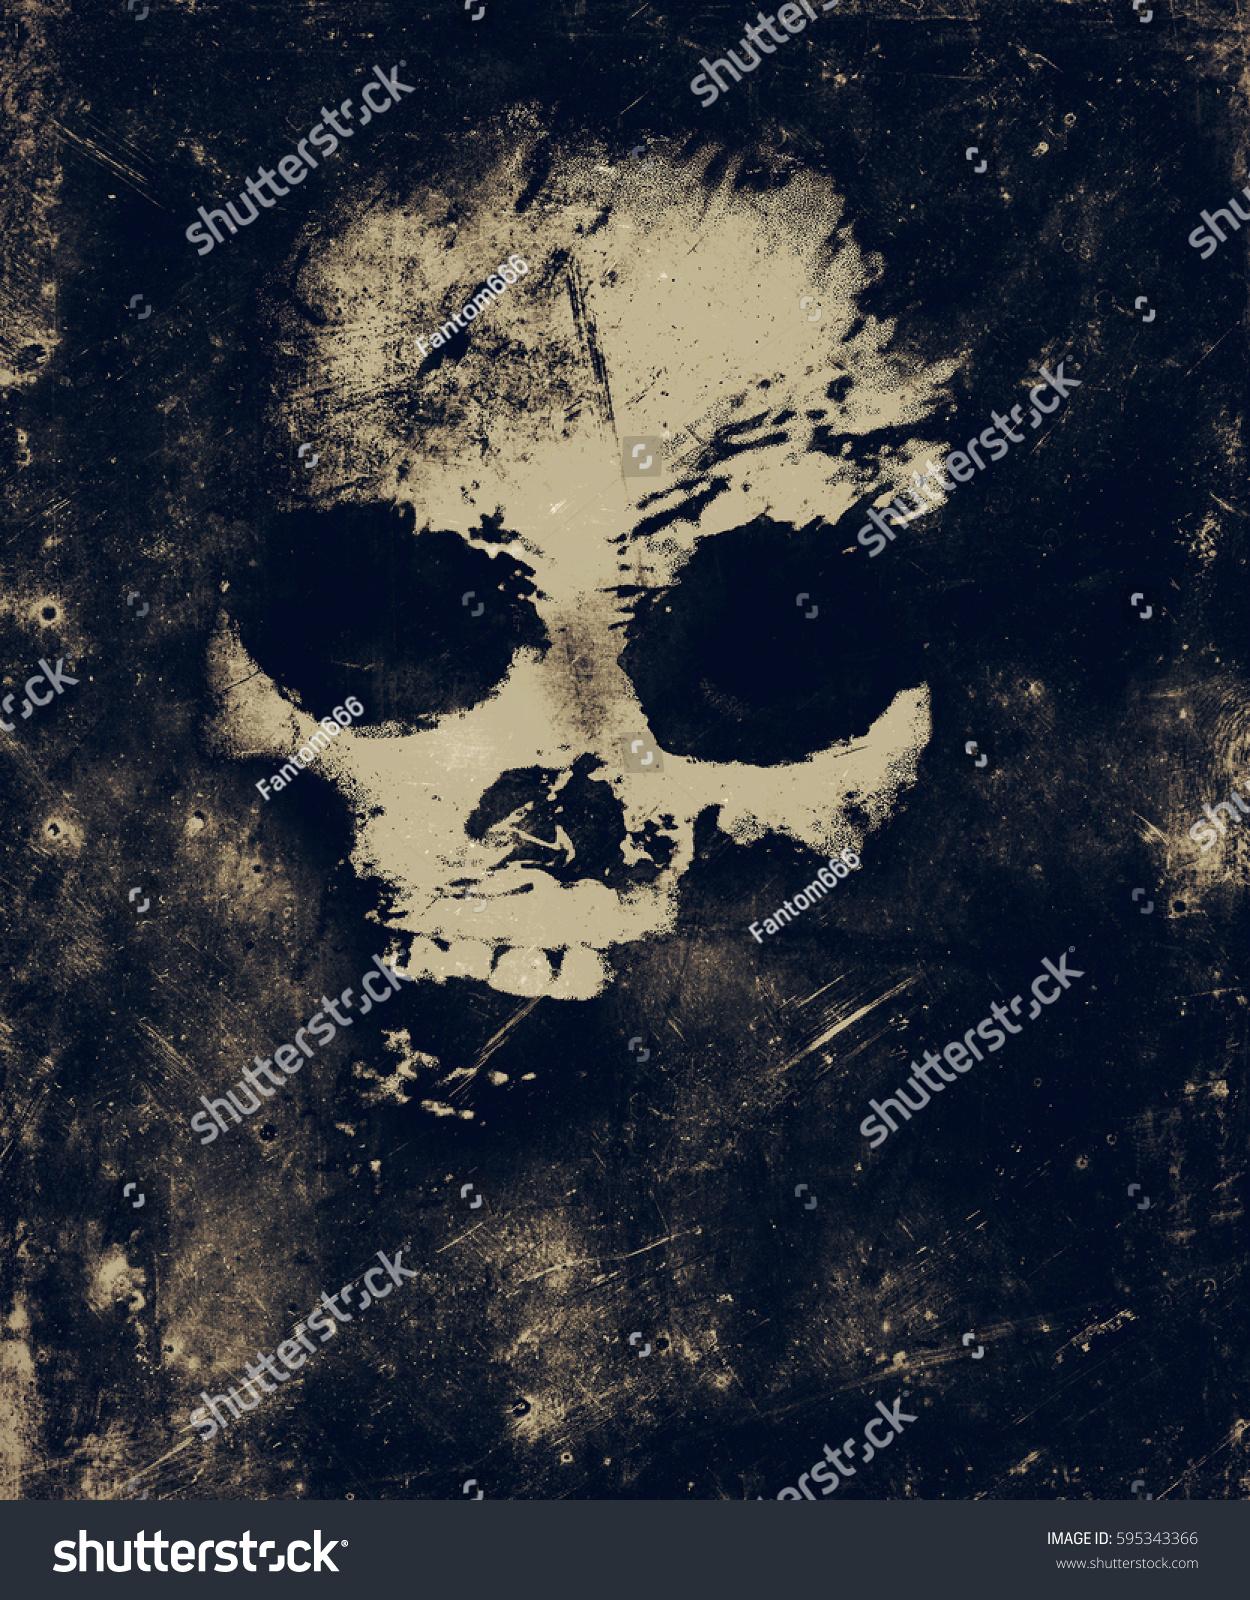 Simple Wallpaper Halloween Skull - stock-photo-scary-grunge-skull-wallpaper-halloween-background-595343366  Trends_423487.jpg